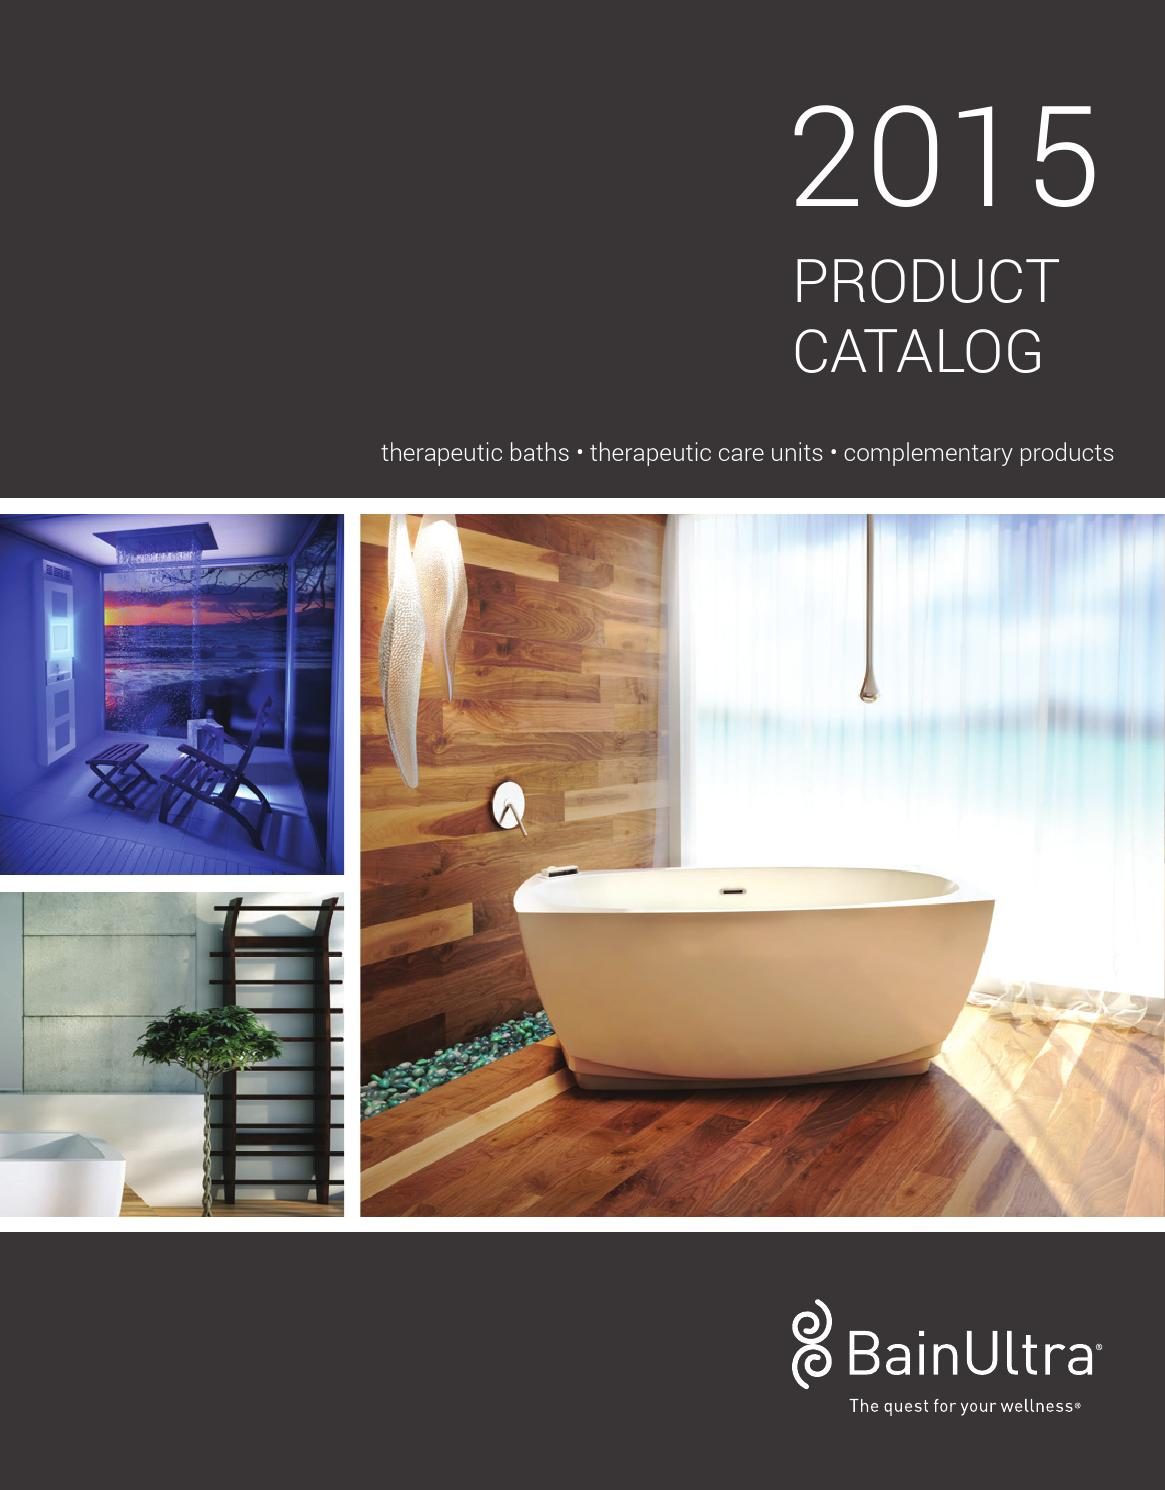 BAINULTRA 2015 Product Catalog by BainUltra - issuu